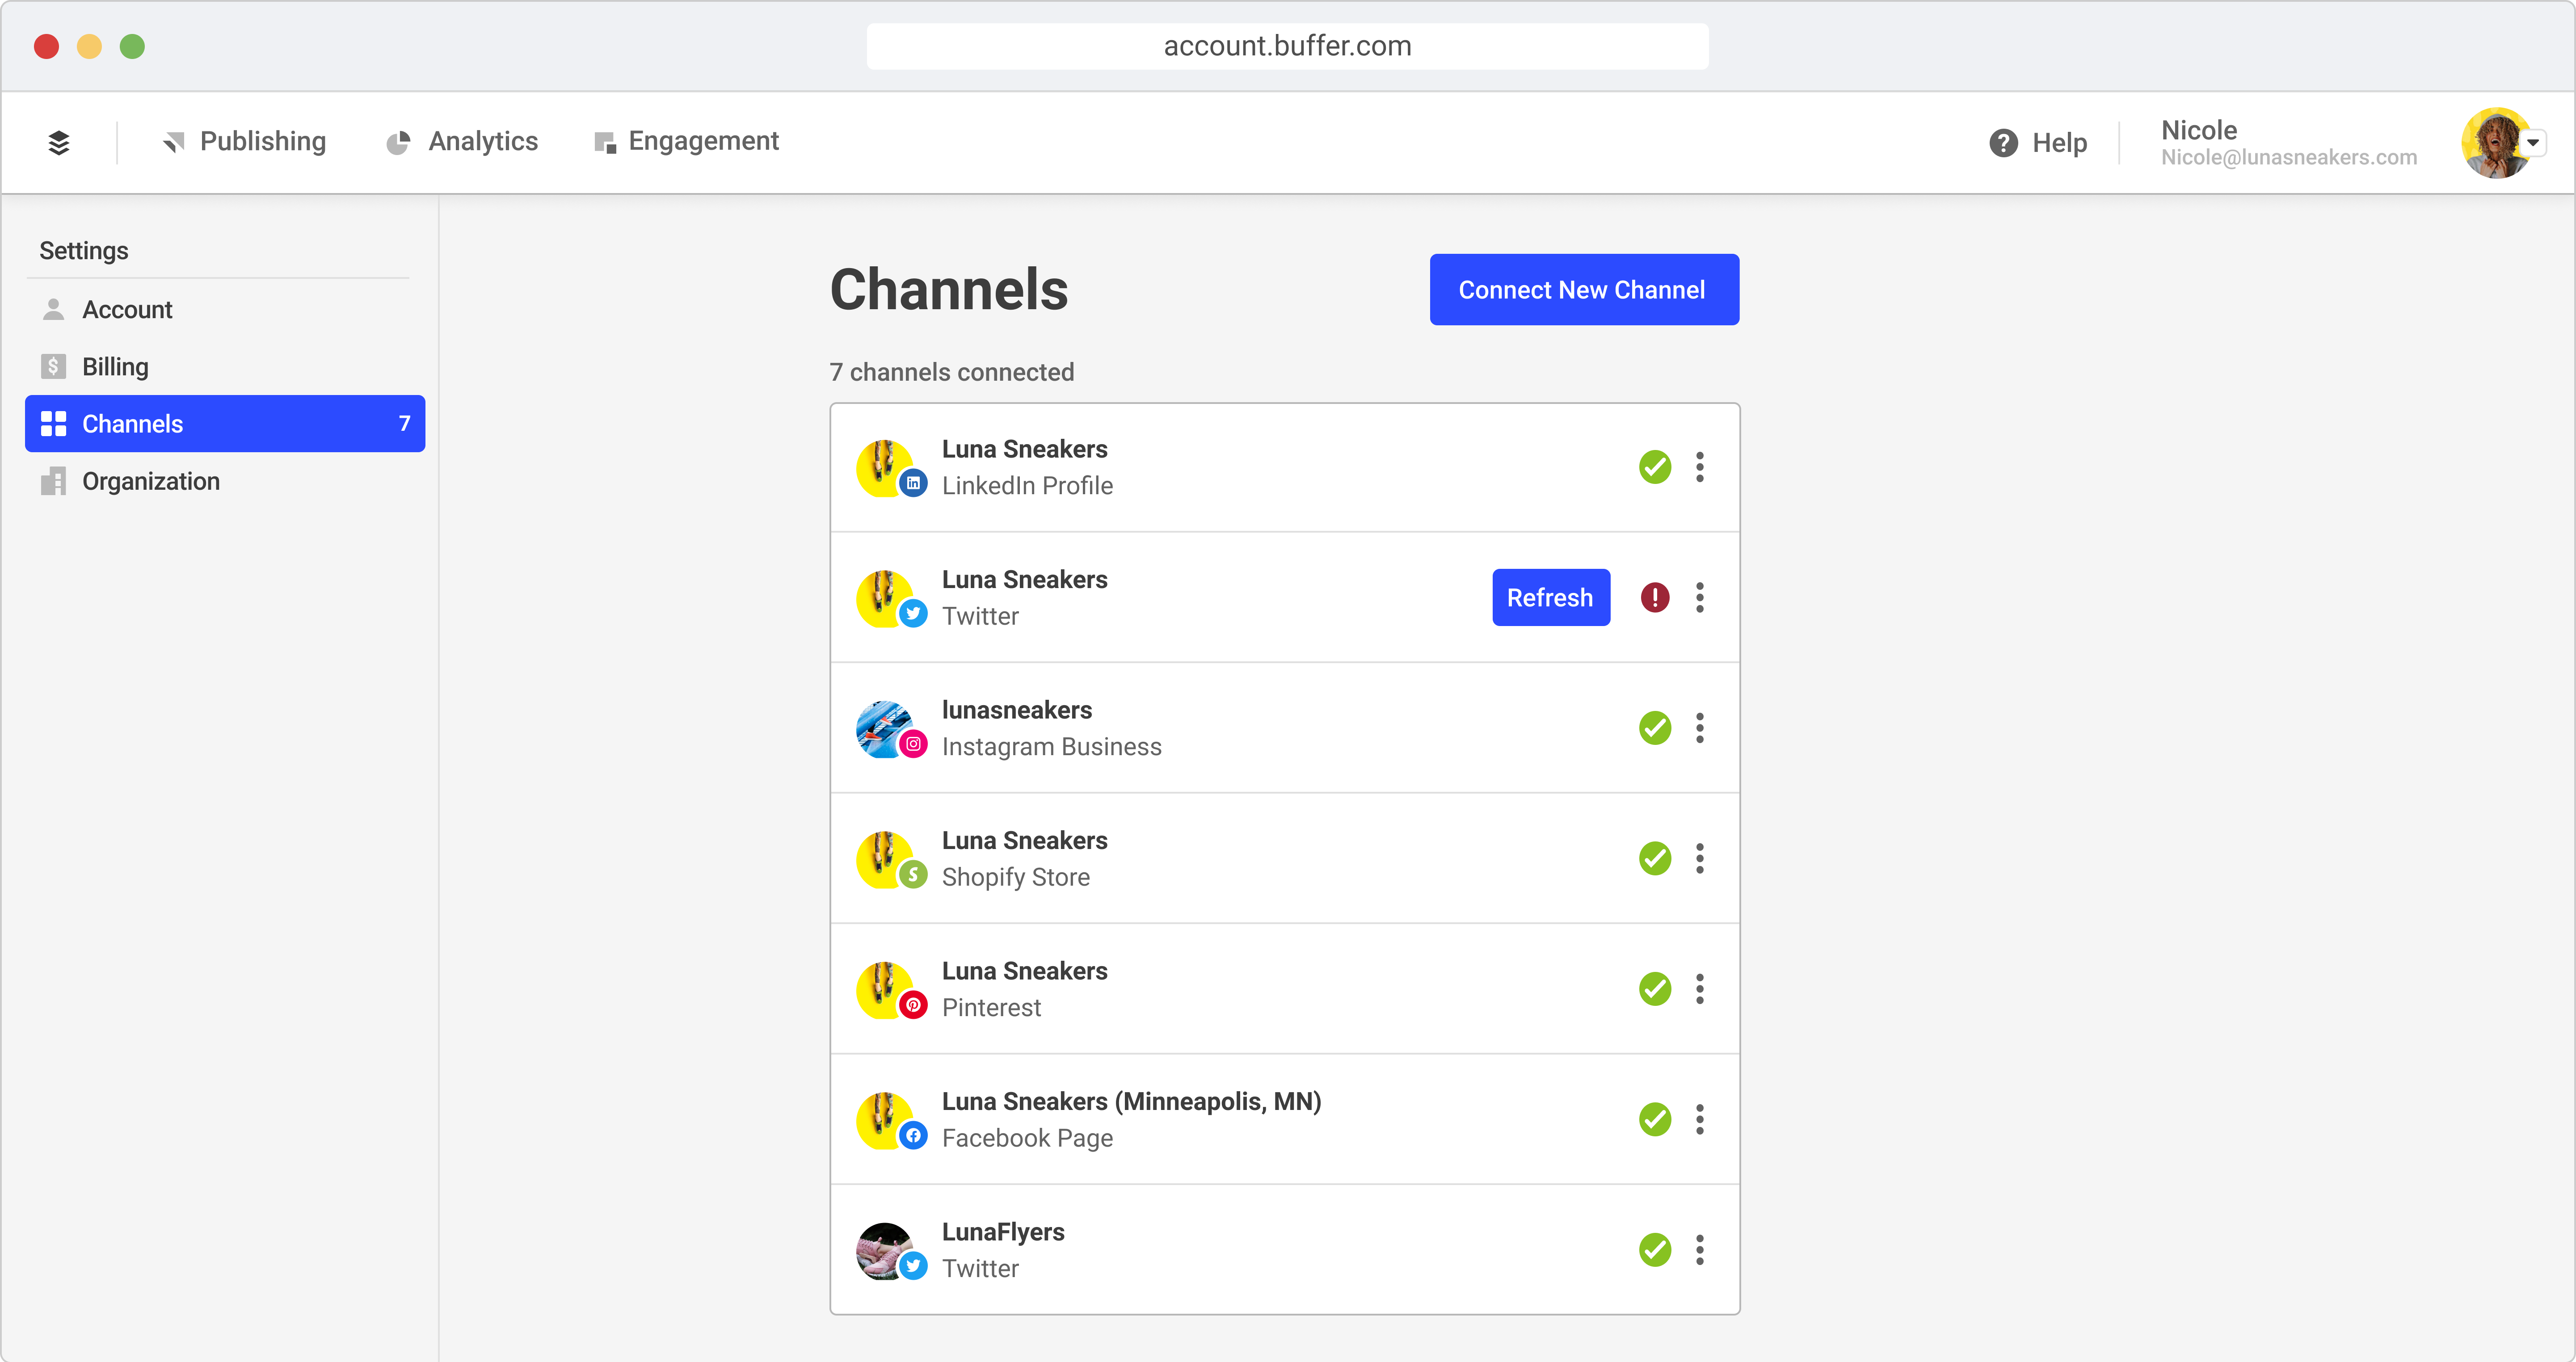 Mockup of channels list screen